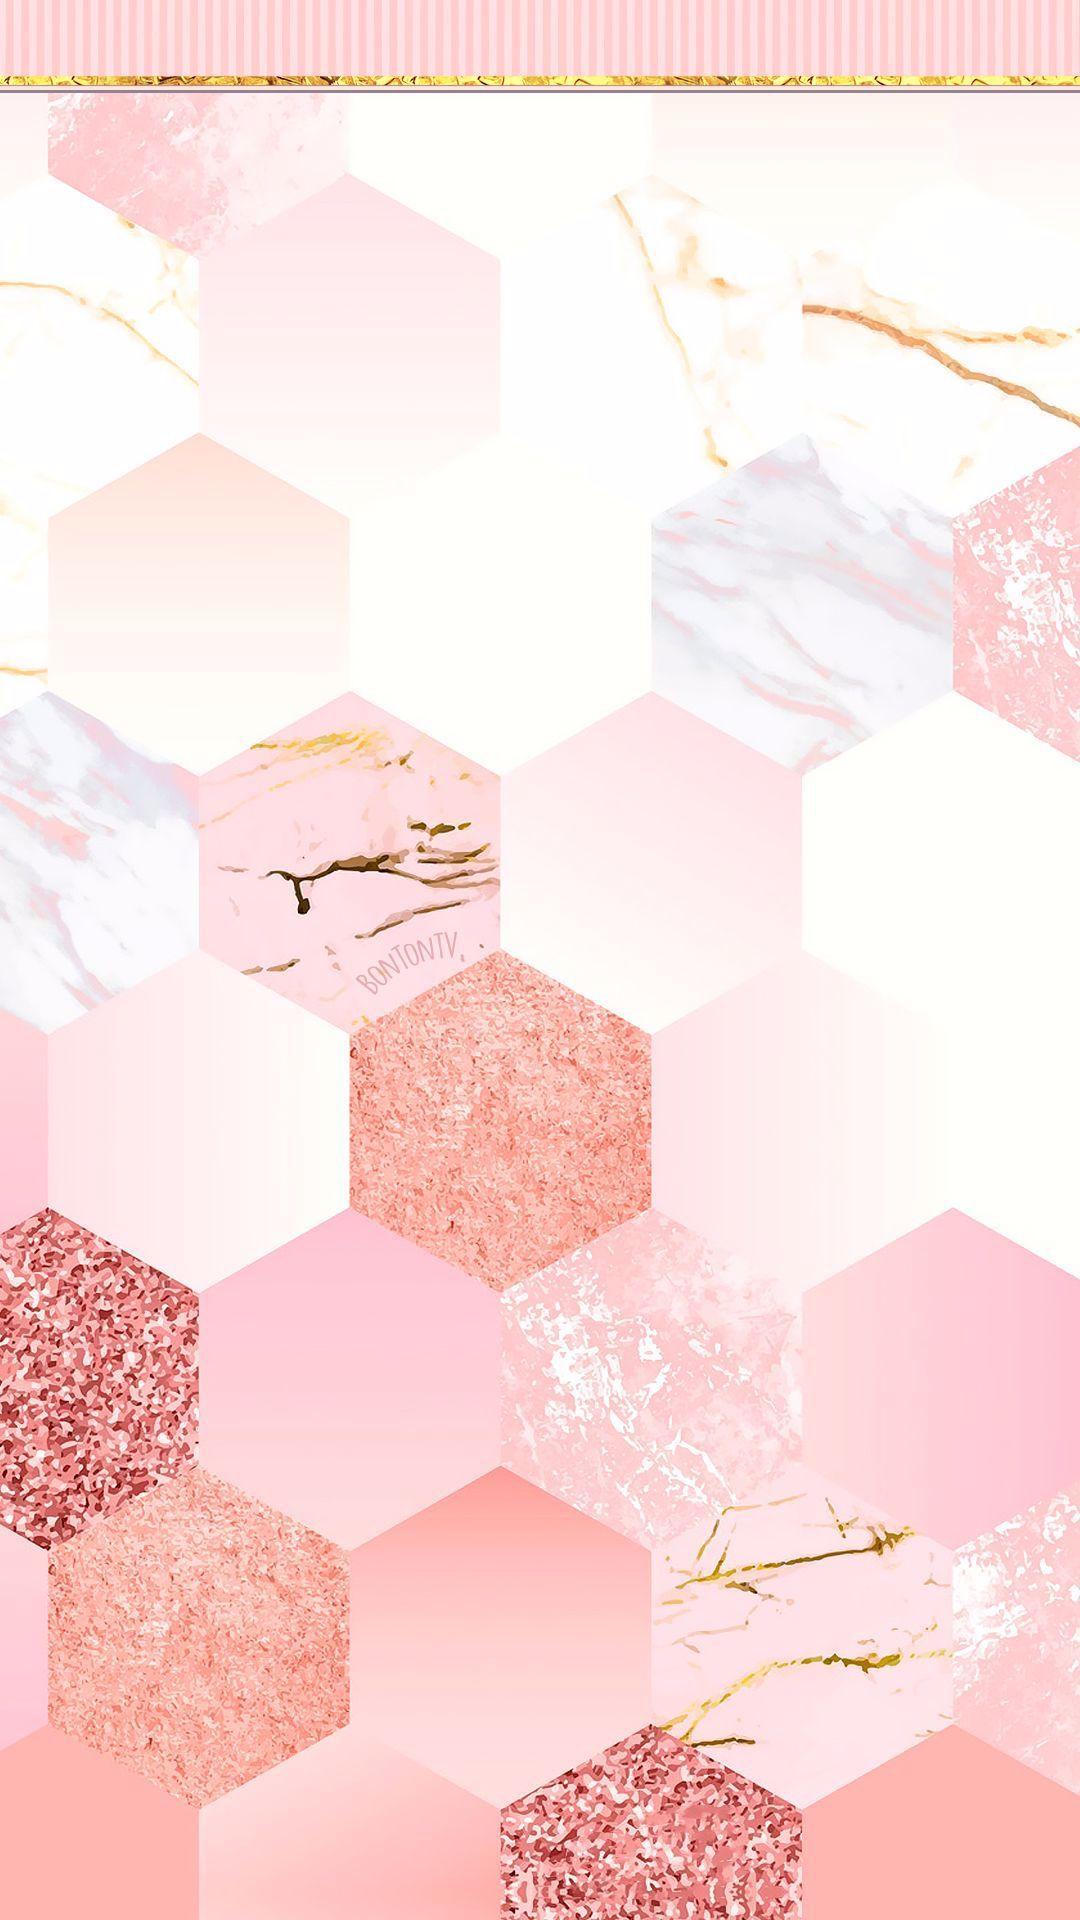 Pozadine Za Telefon In 2020 Phone Wallpaper Wallpaper Pink